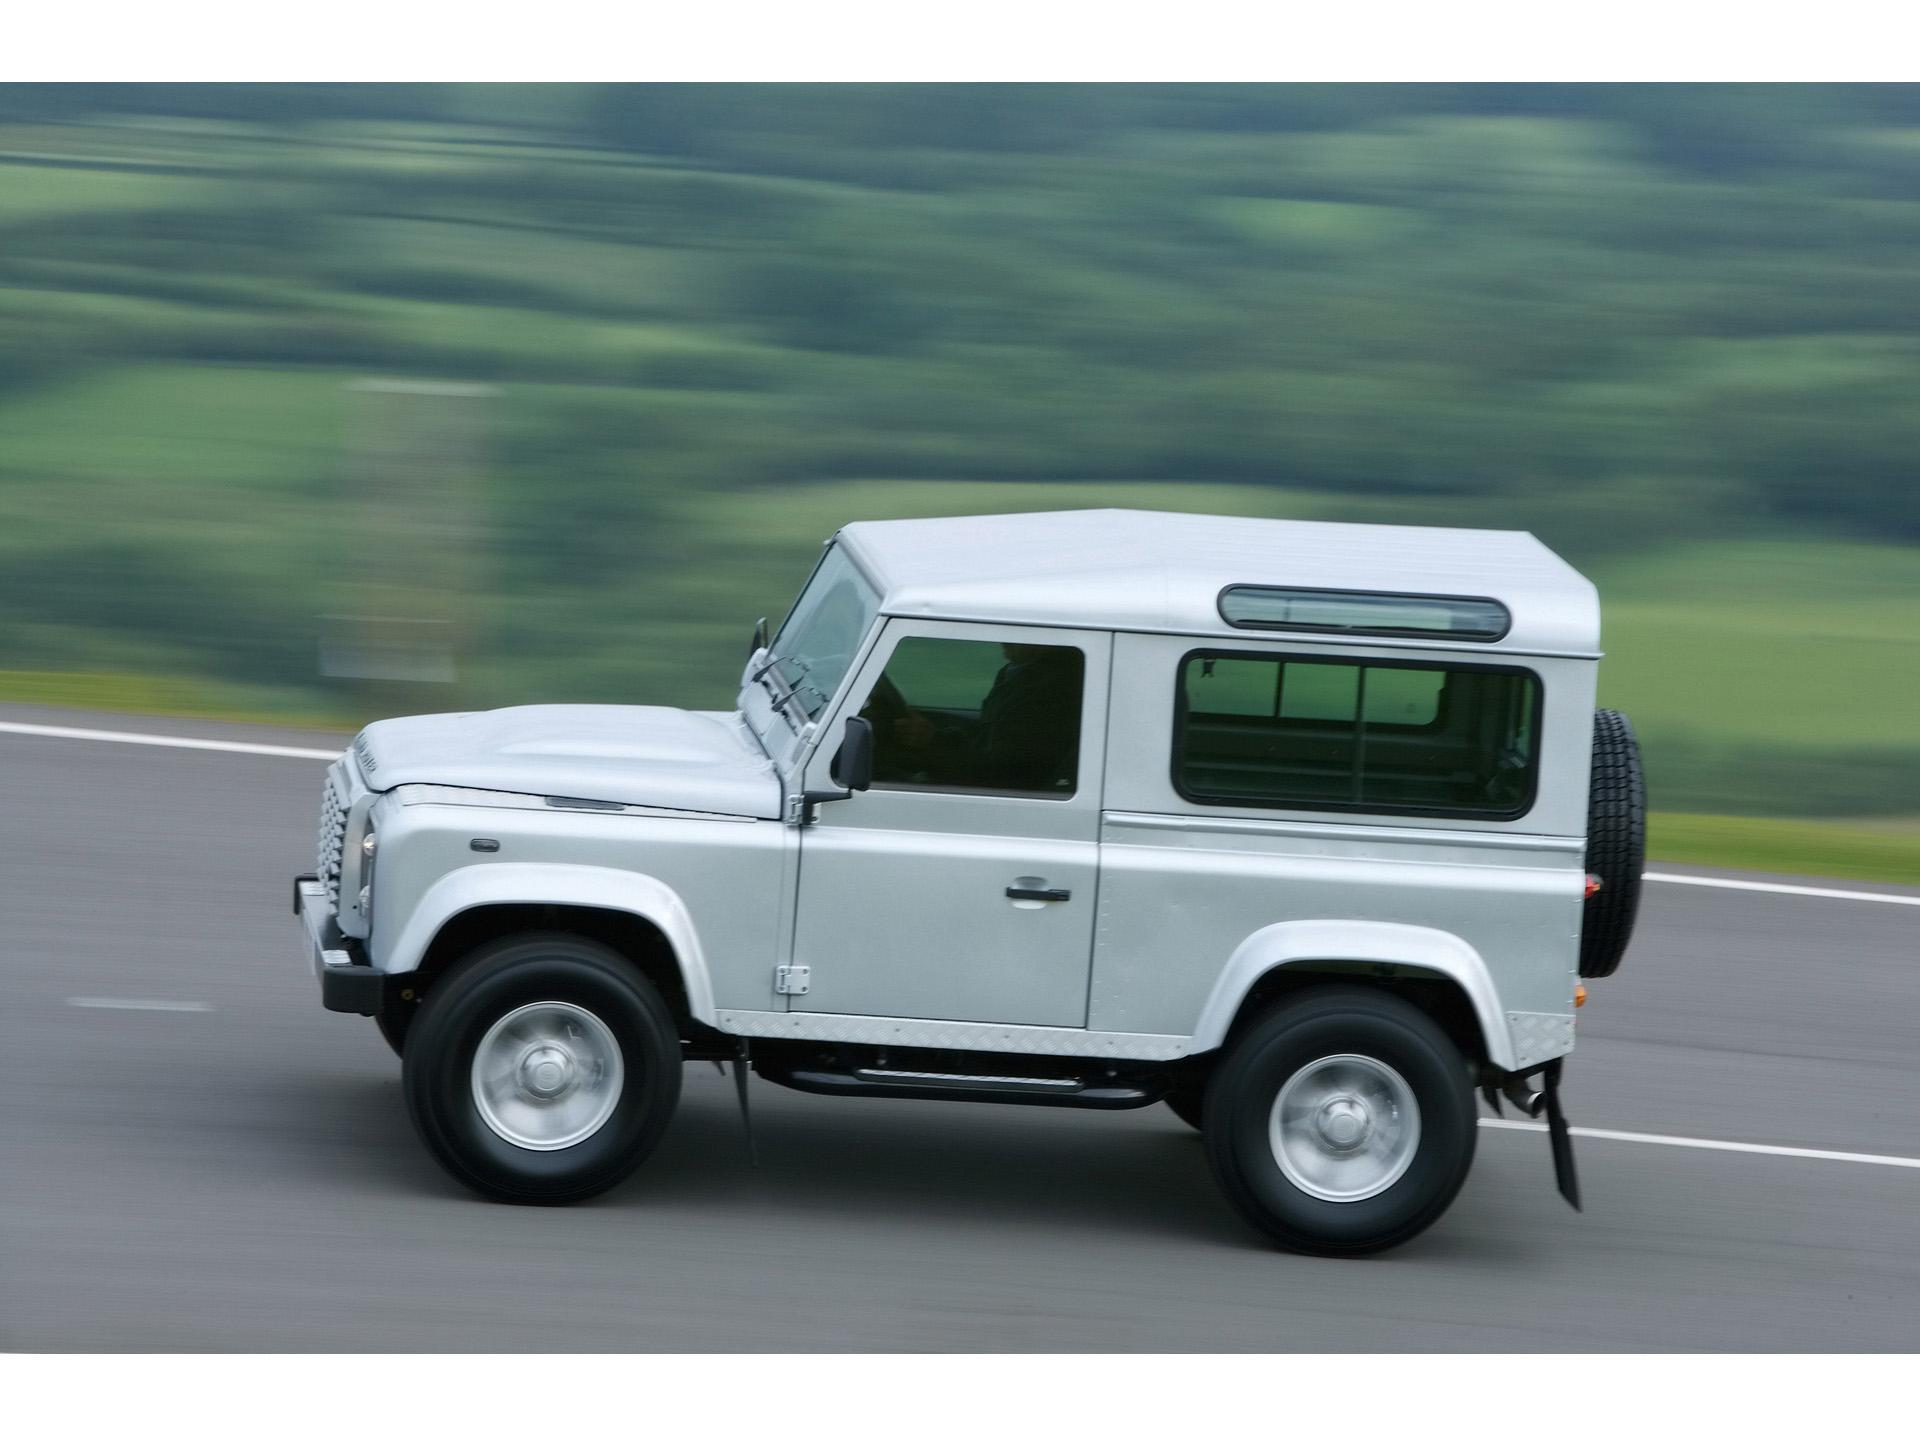 2008 Land Rover Defender Svx News And Information